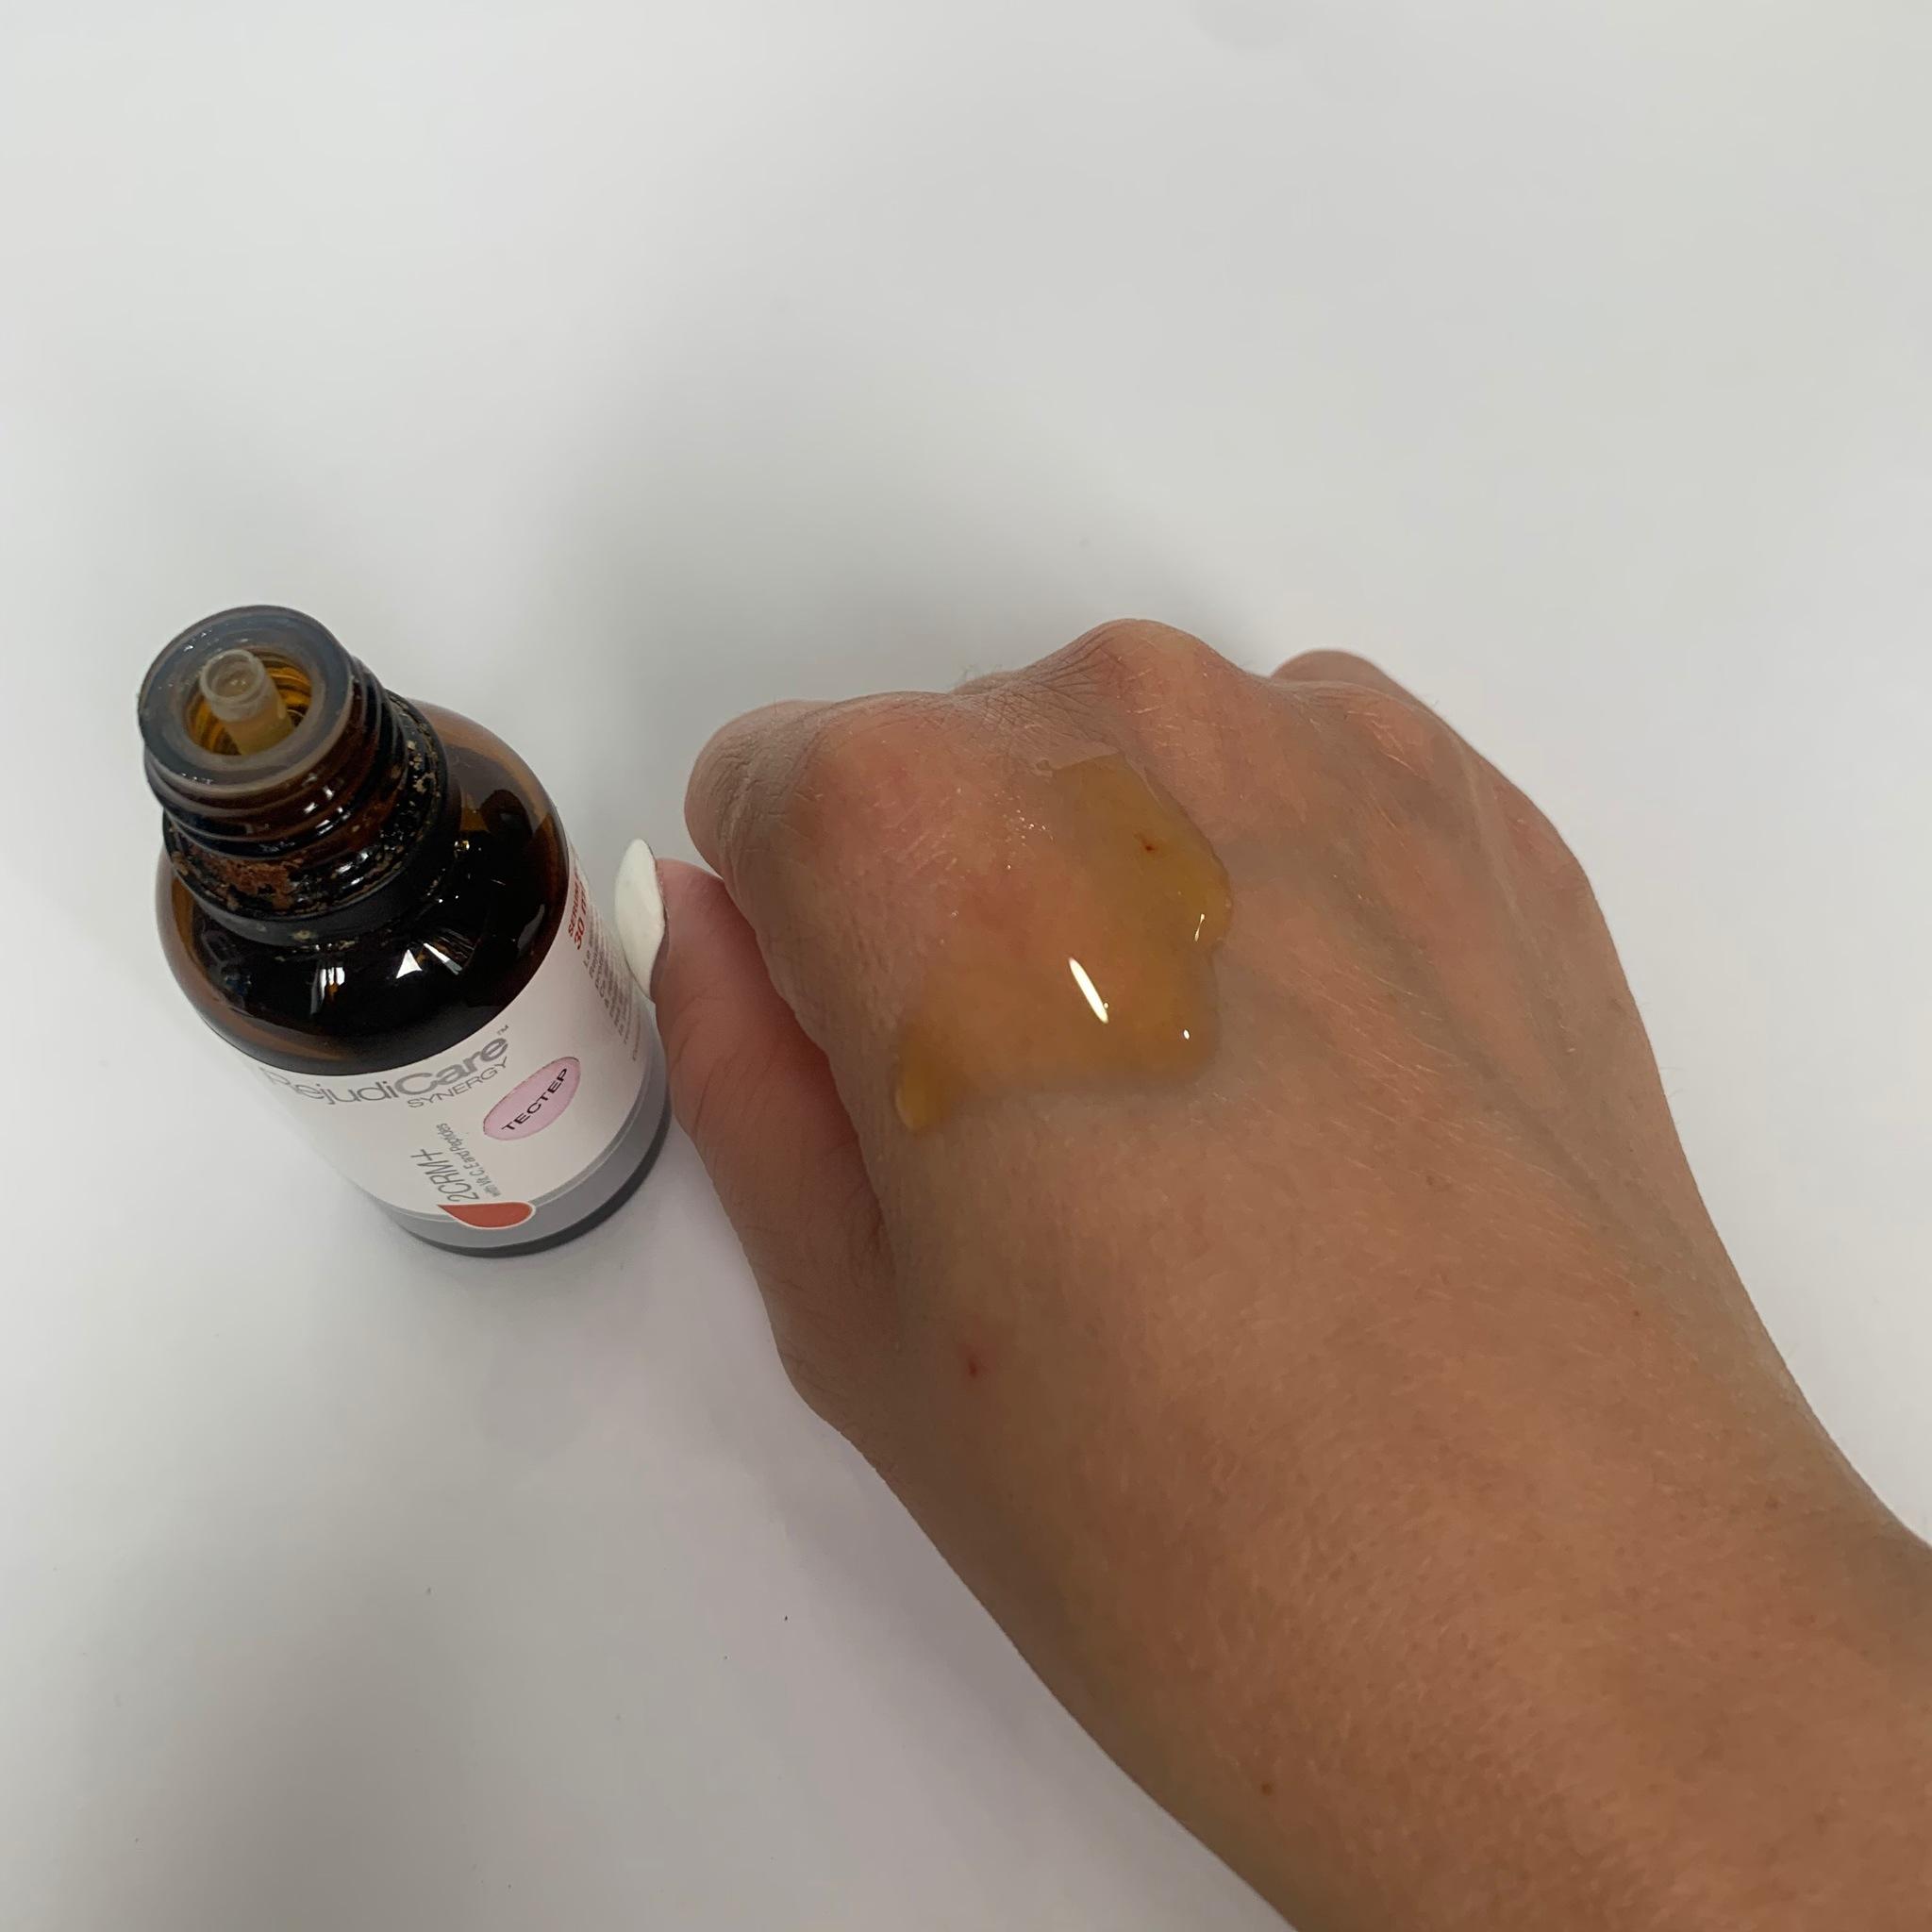 Сыворотка RejudiCare анти-эйджинг с витаминами С и Е и пептидами 2CRM+ 30 ml